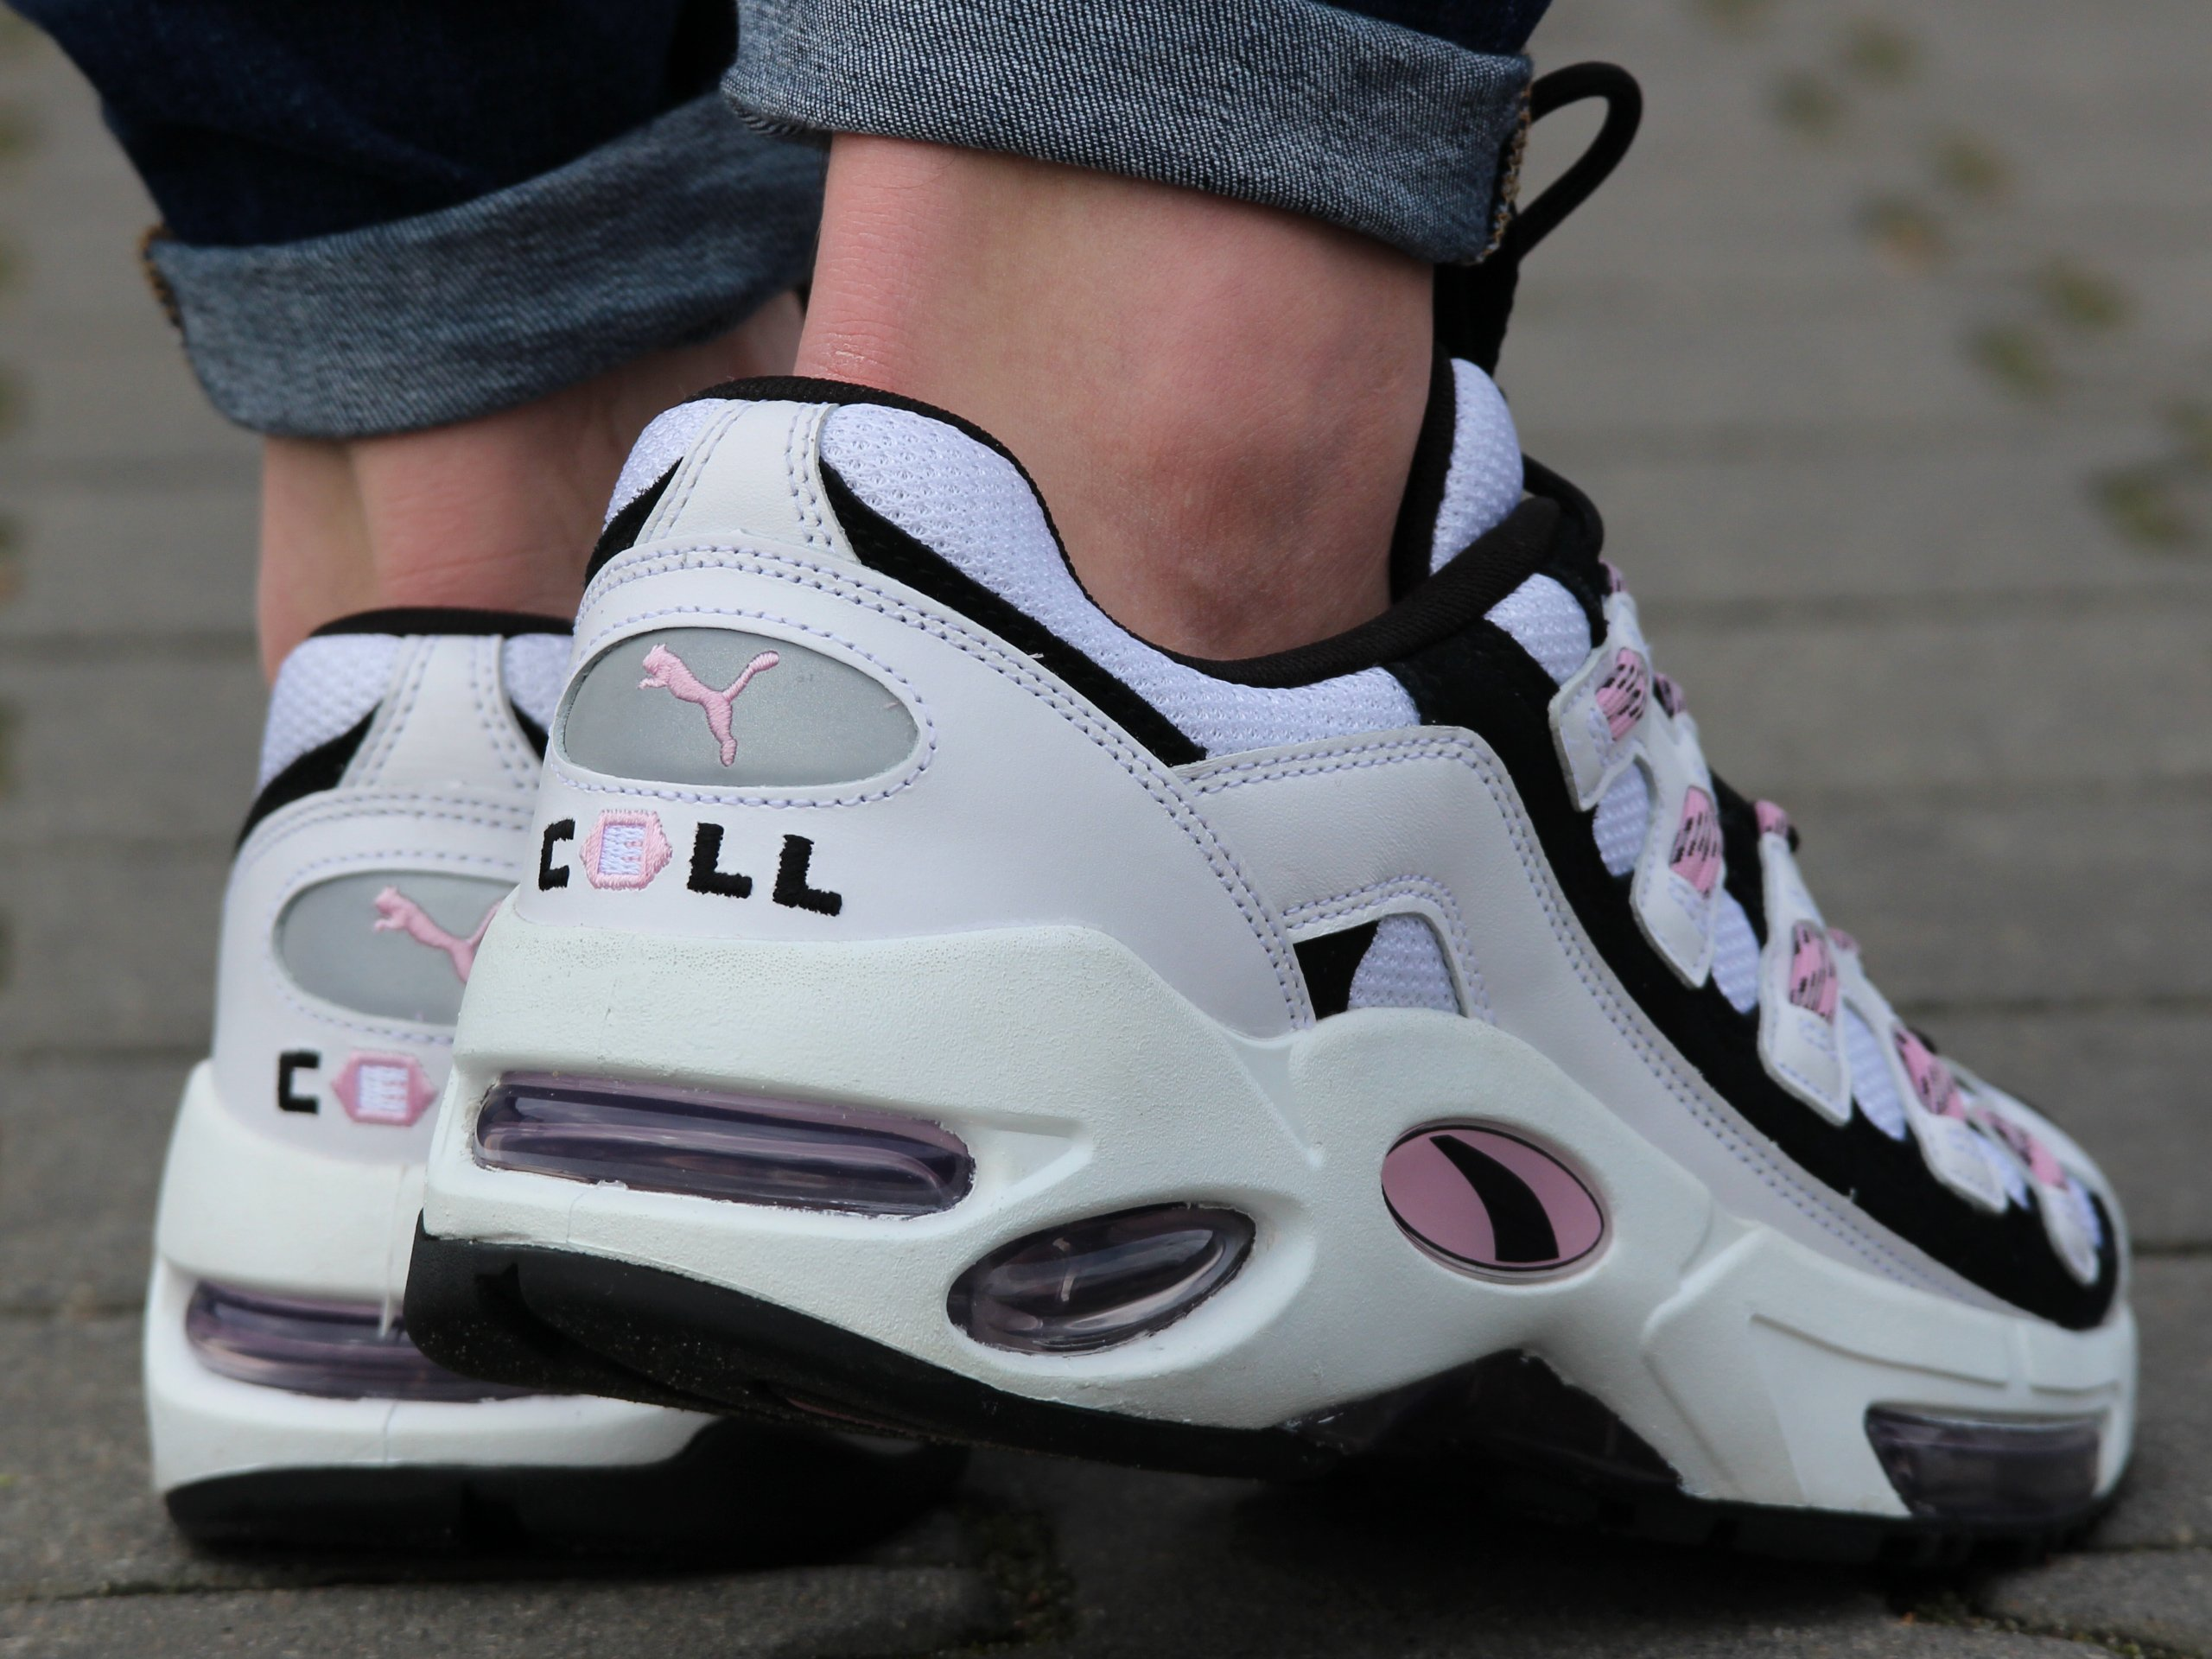 Puma - Cell Endura 369357-05 - Sneakers - White / Black / Pink ...